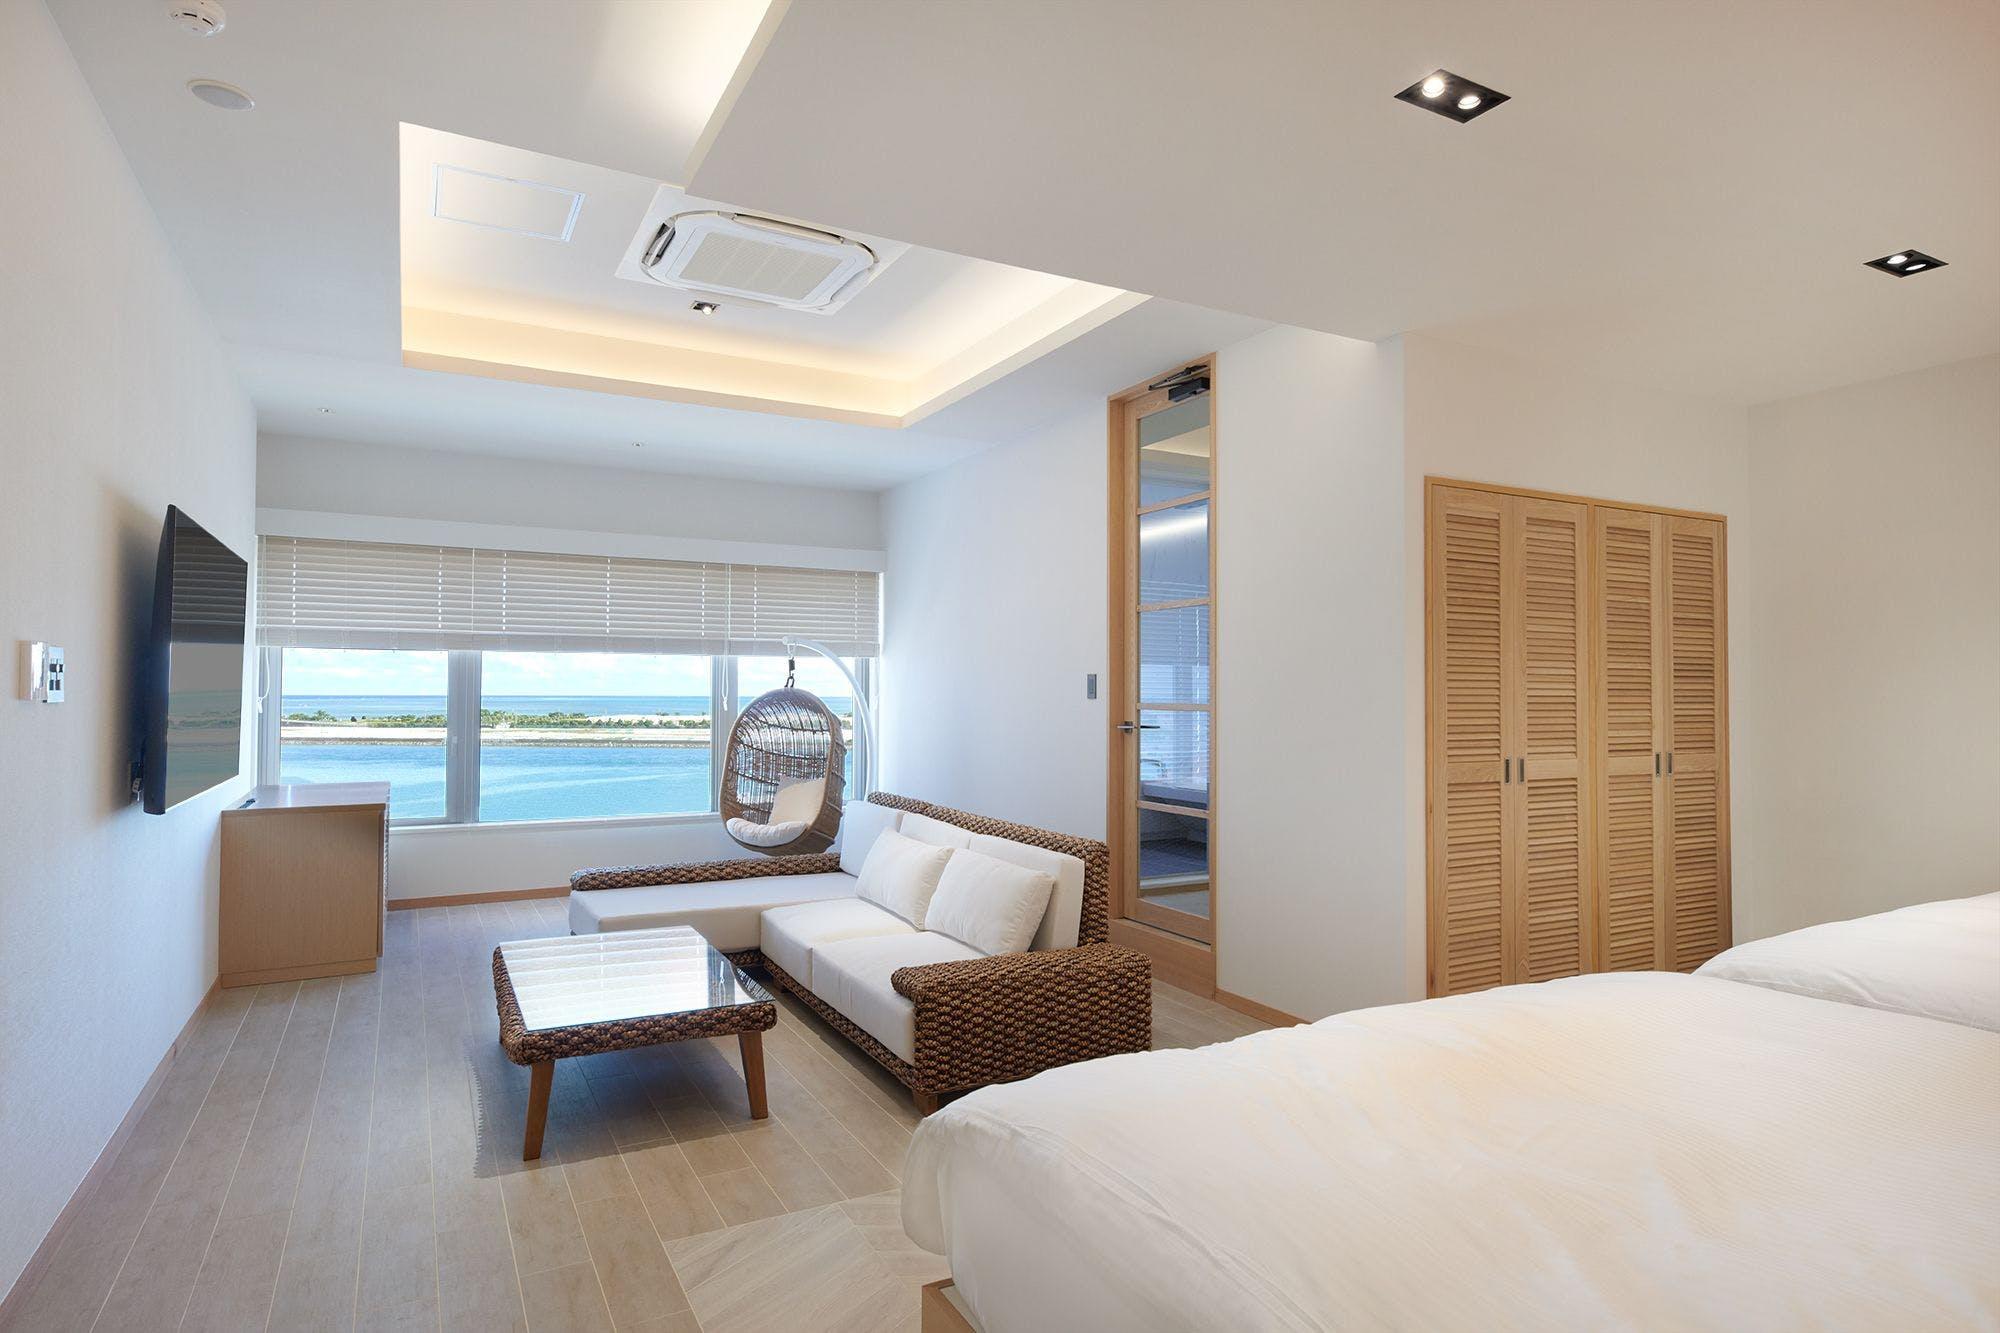 THIRD石垣島 / シービューバスジュニアスイート